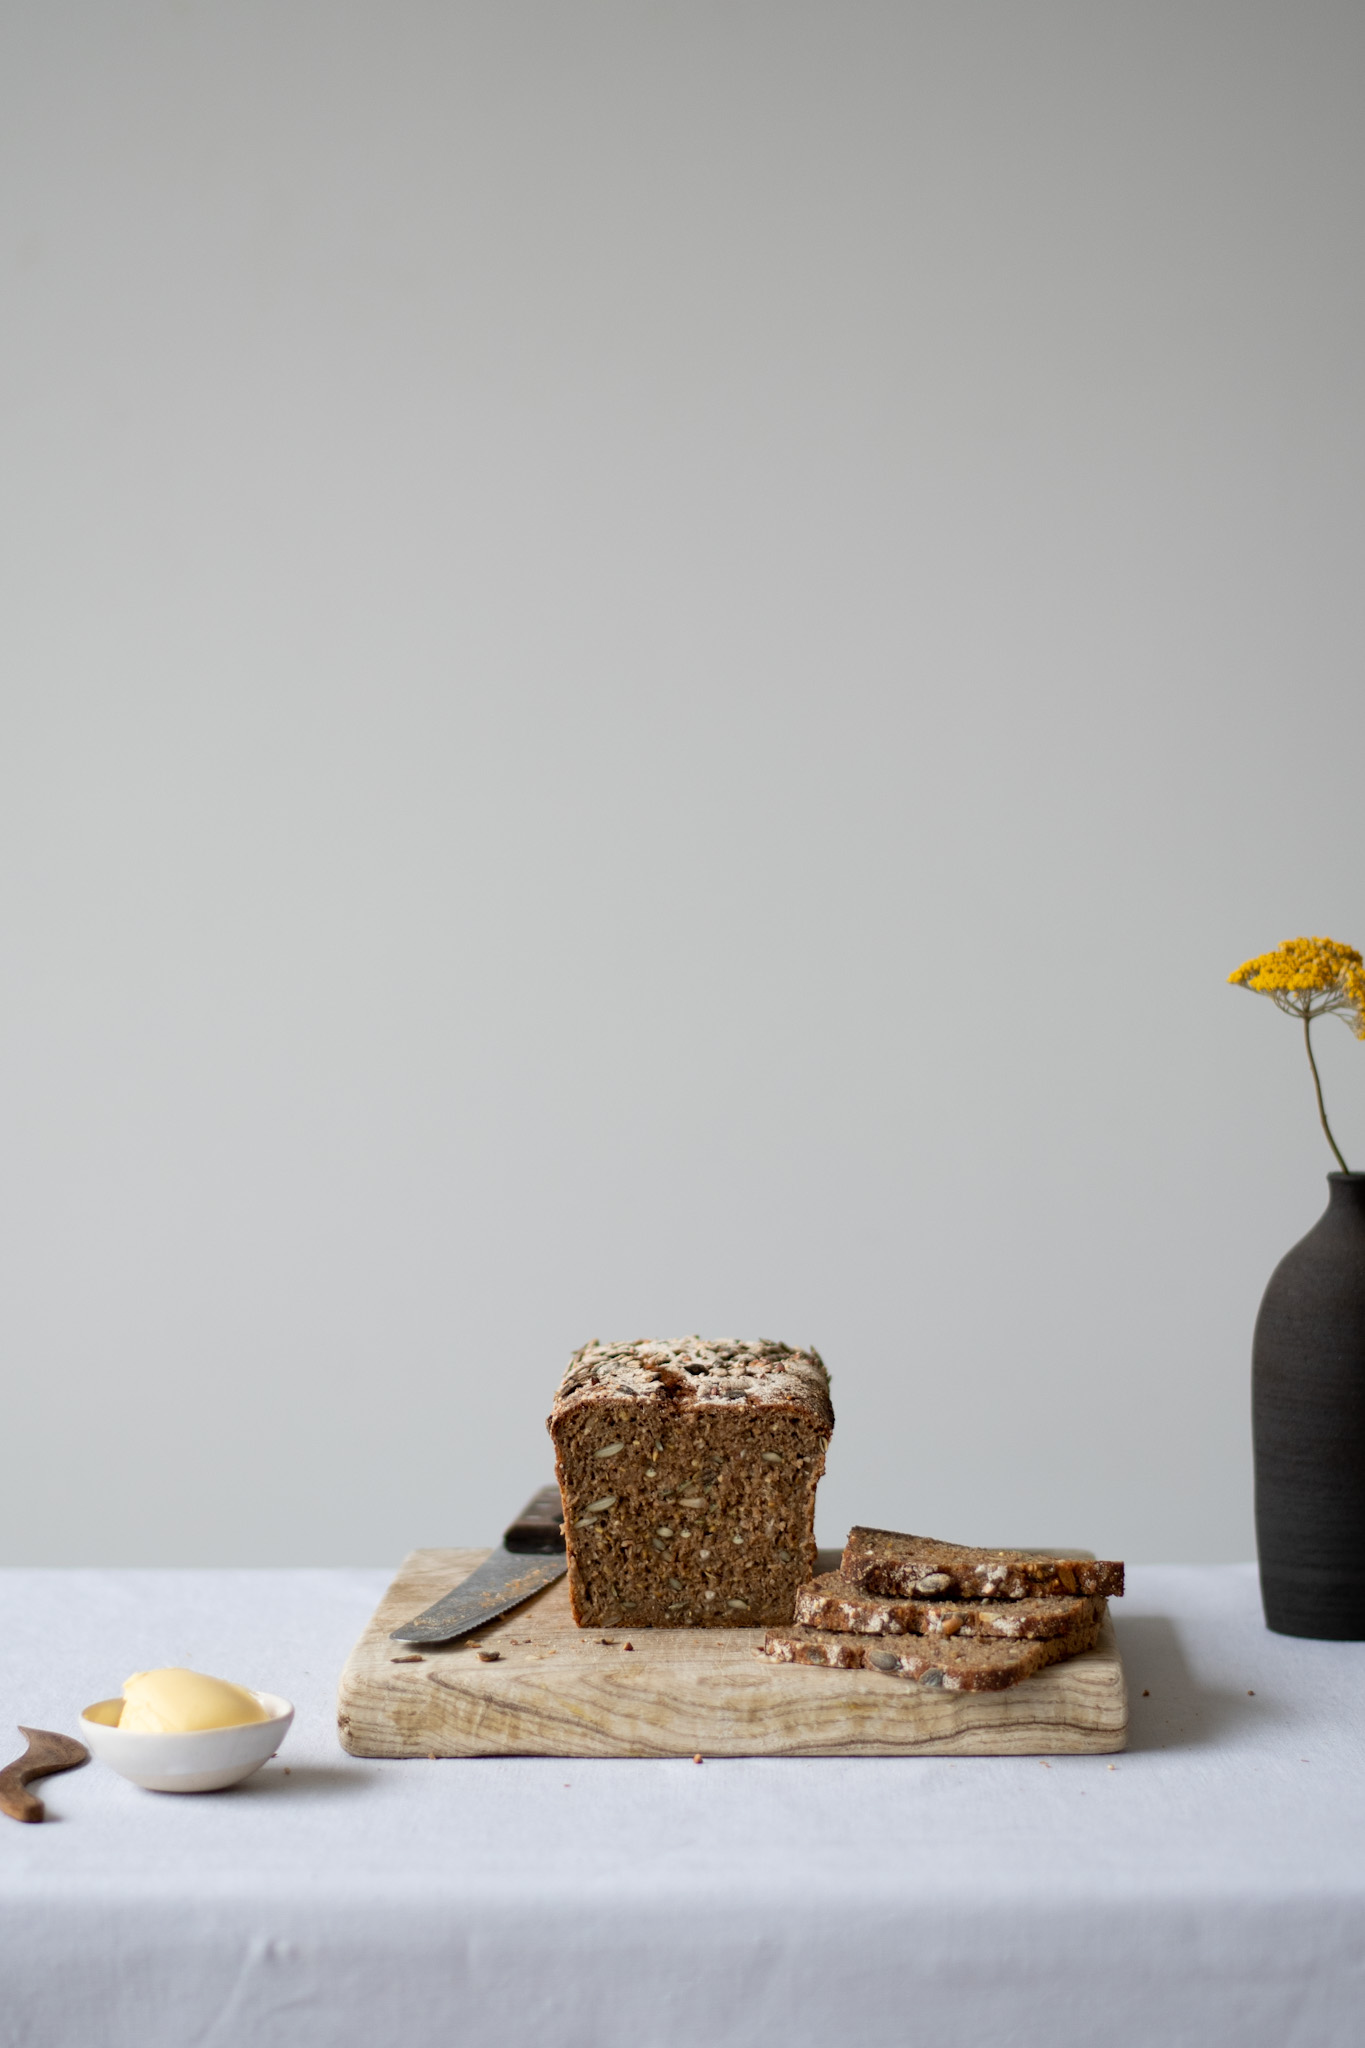 Danish Sourdough Rye